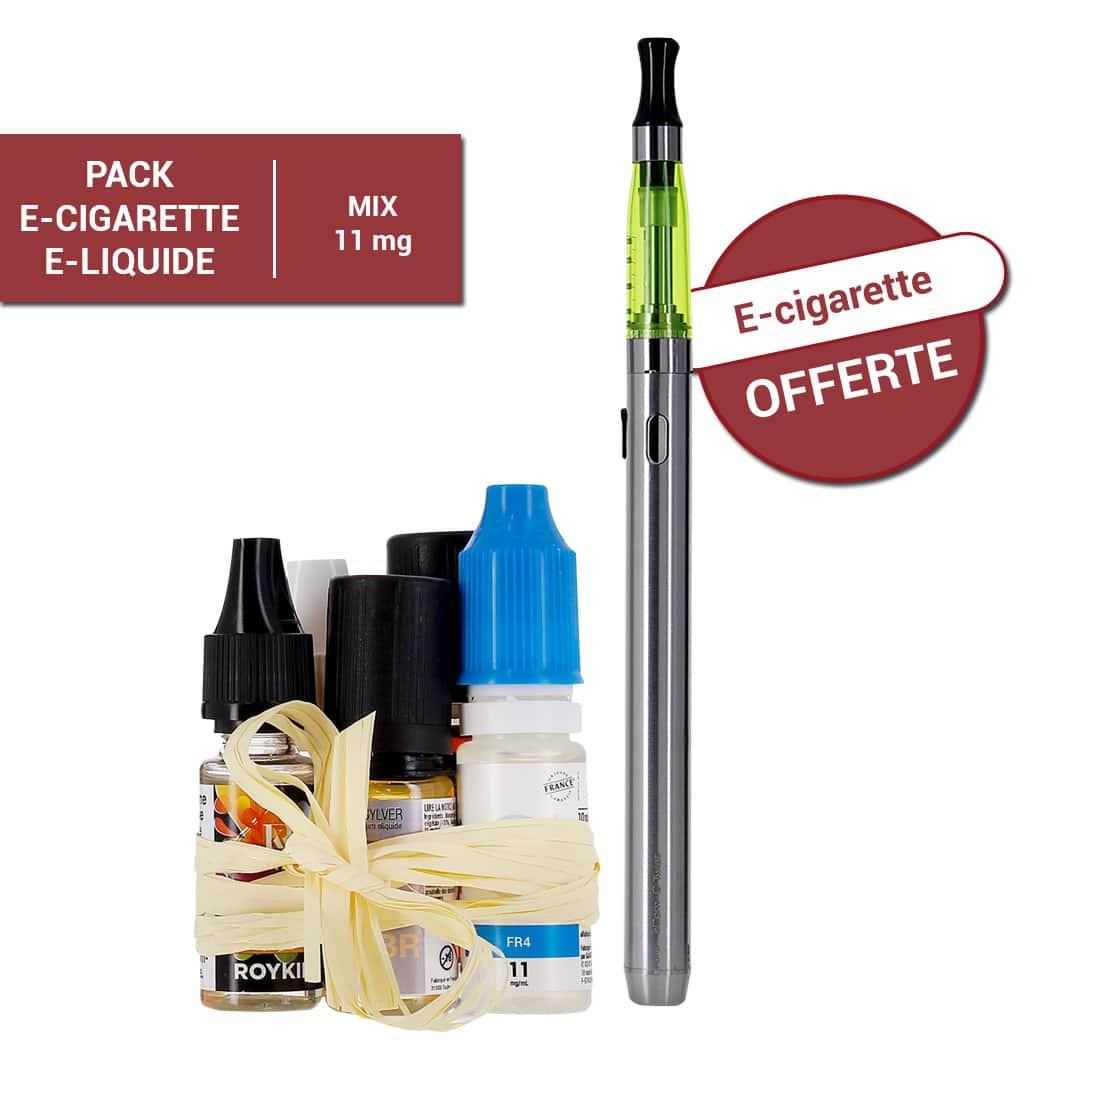 Photo de Pack e-cigarette e-liquide 11 mg Mix